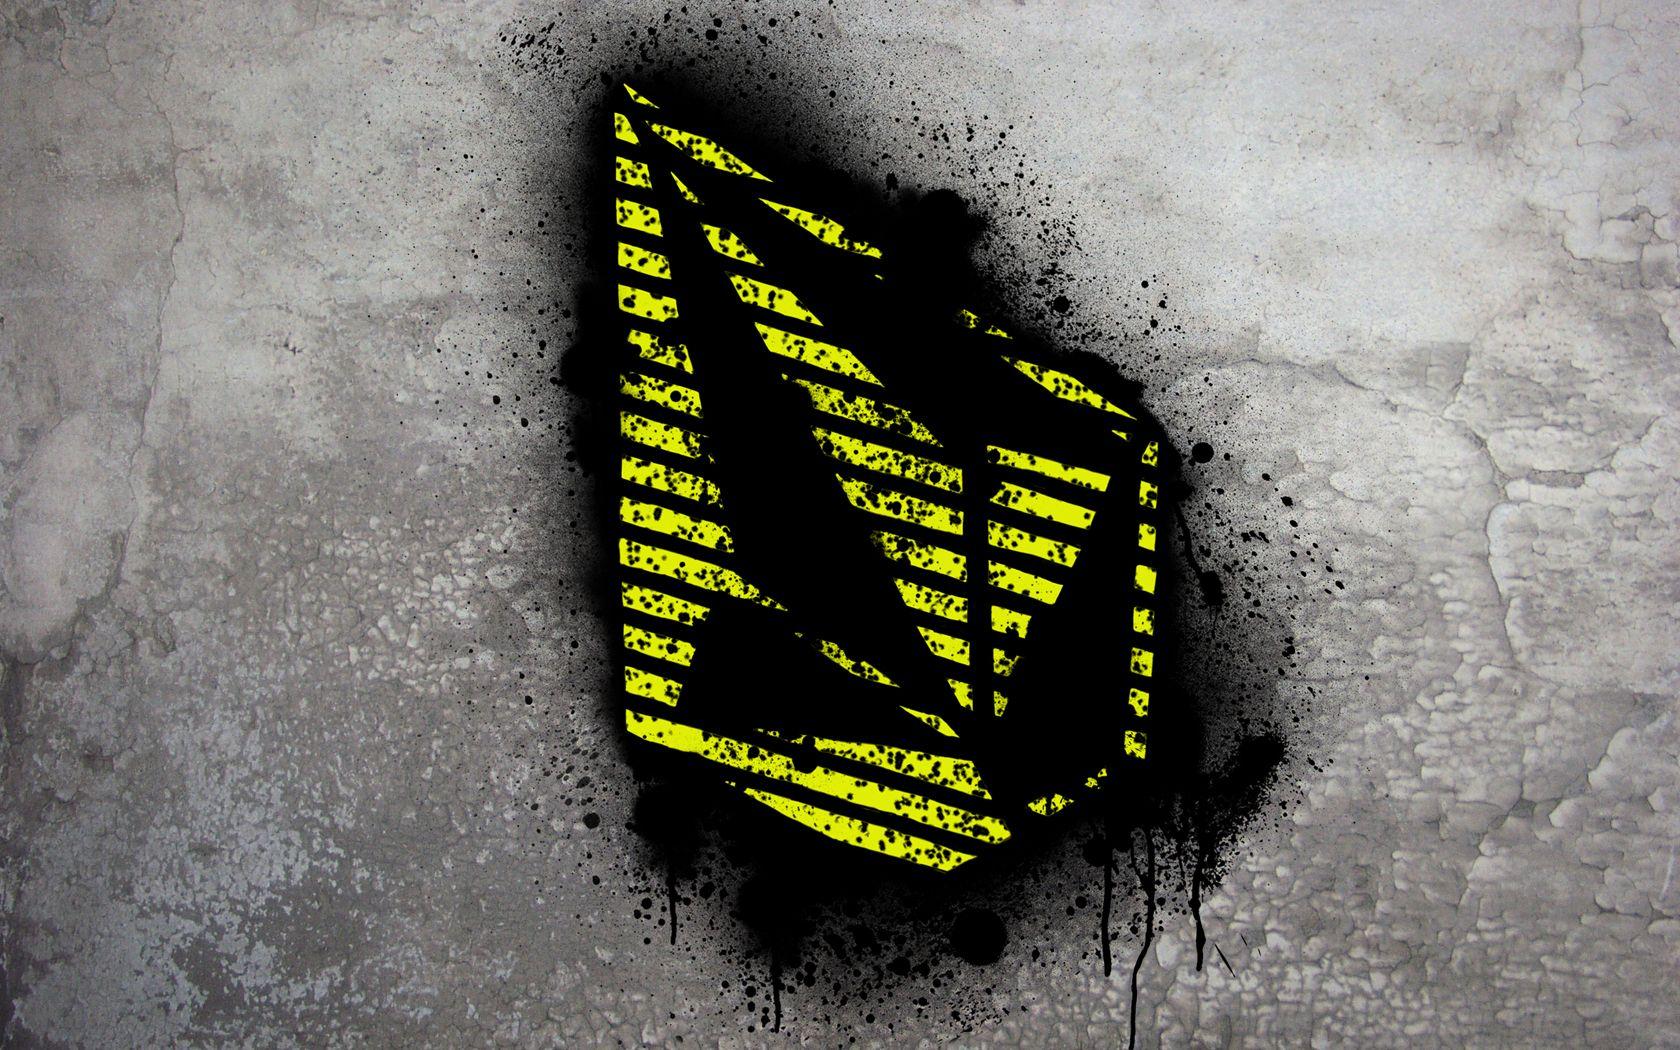 Volcom Wallpapers Free Graffiti Hd Graffiti Wallpaper Graffiti Graphic Tshirt Design